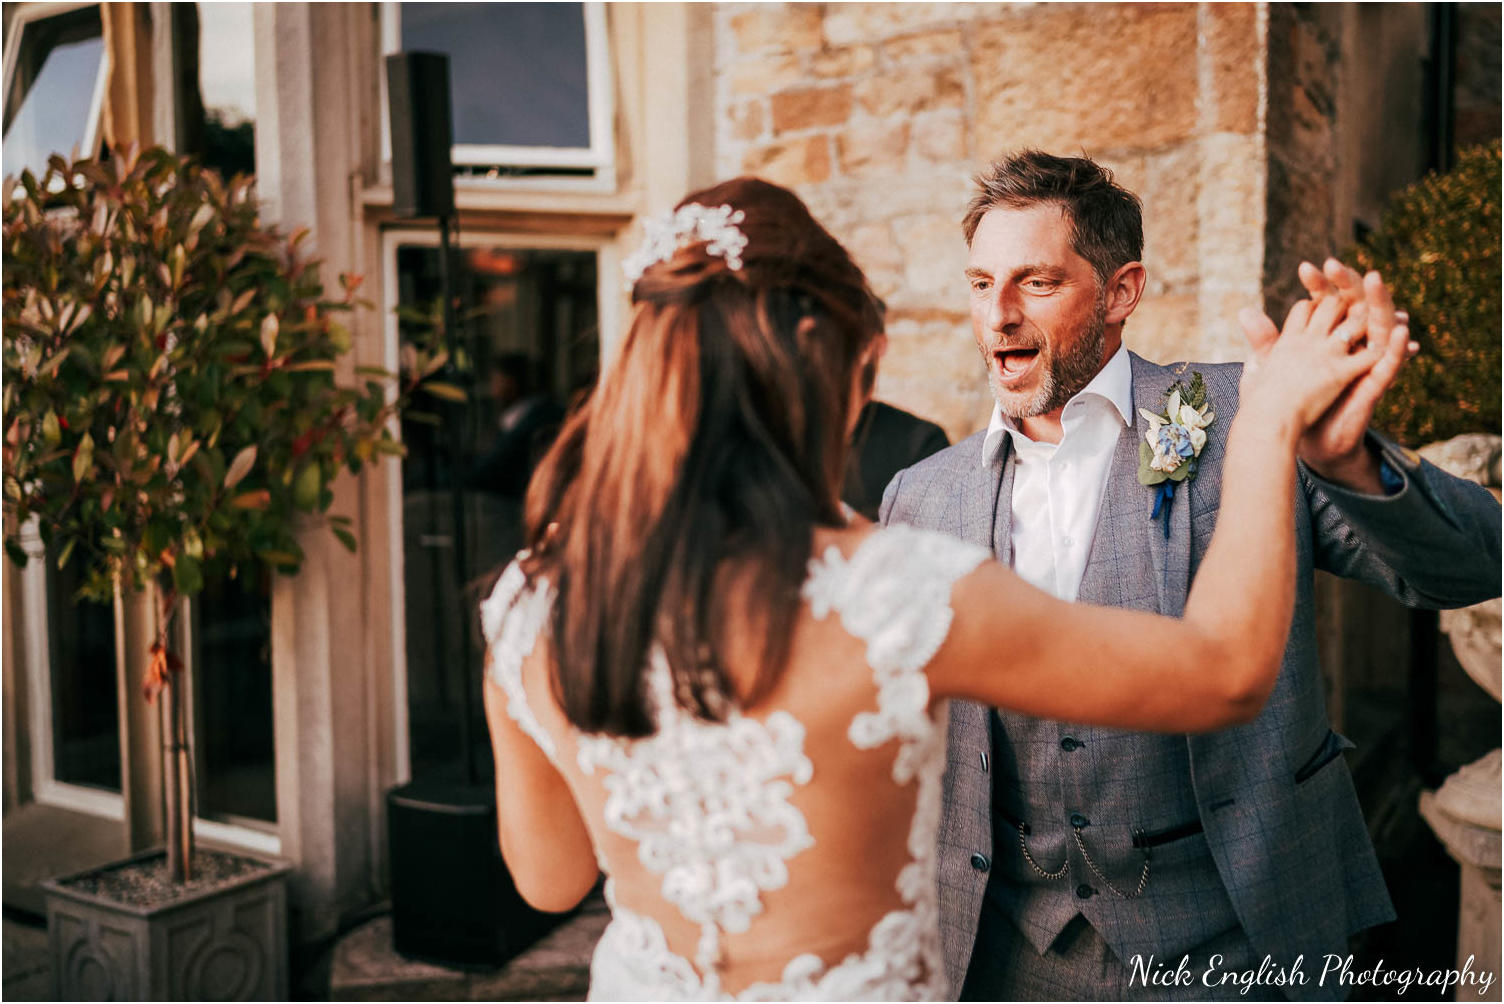 Mitton_Hall_Wedding_Photographer-108.jpg